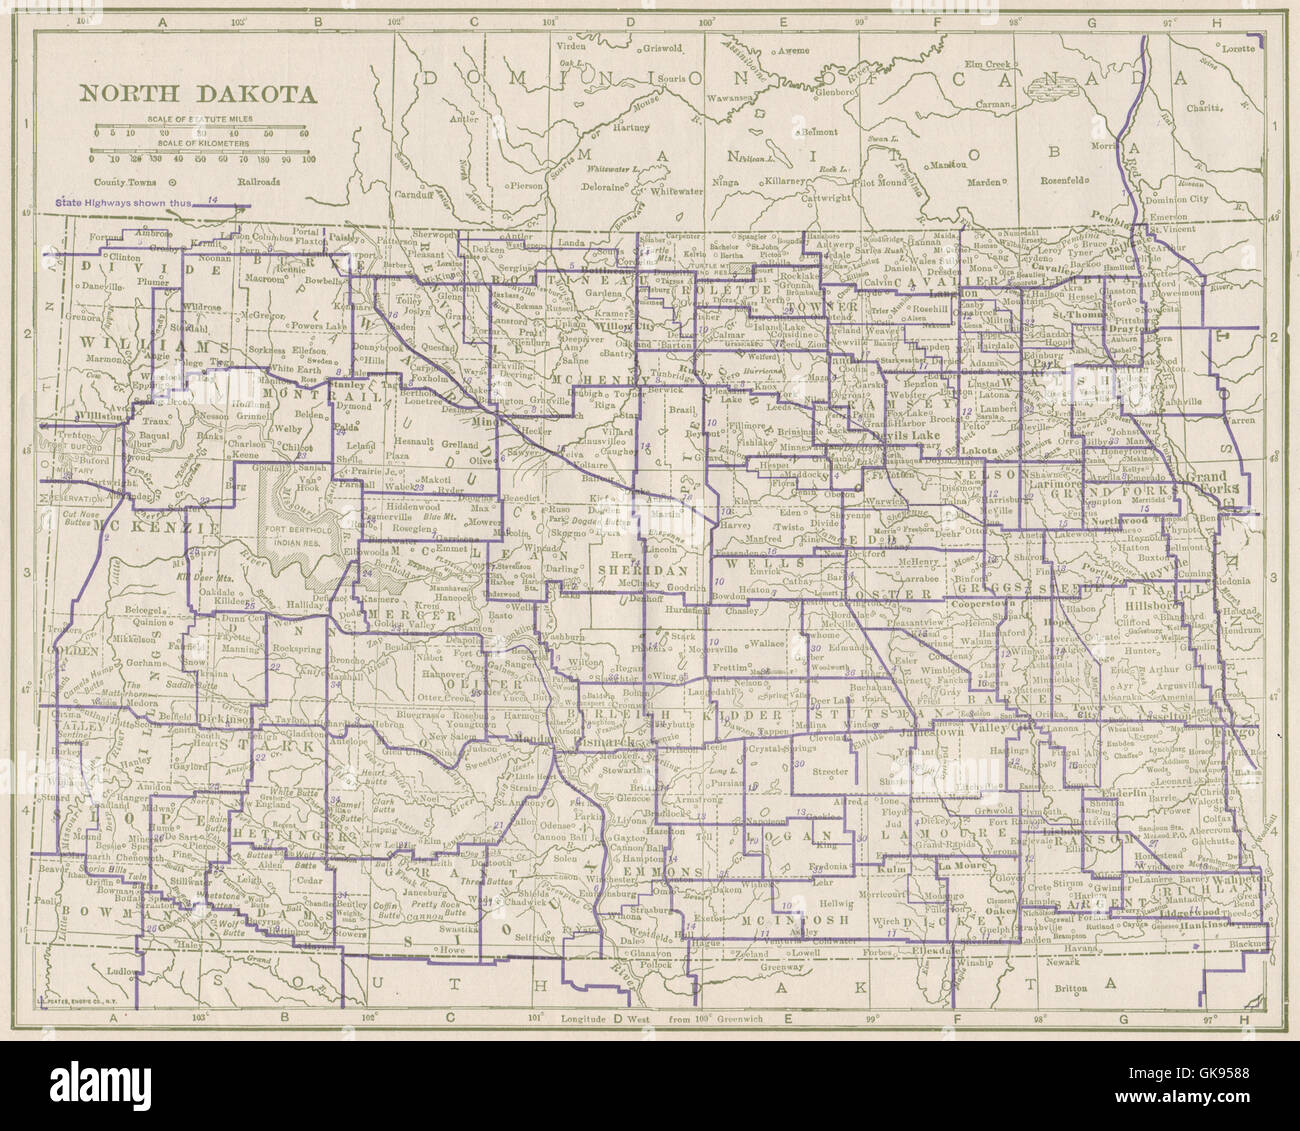 North Dakota Map Stockfotos & North Dakota Map Bilder - Alamy